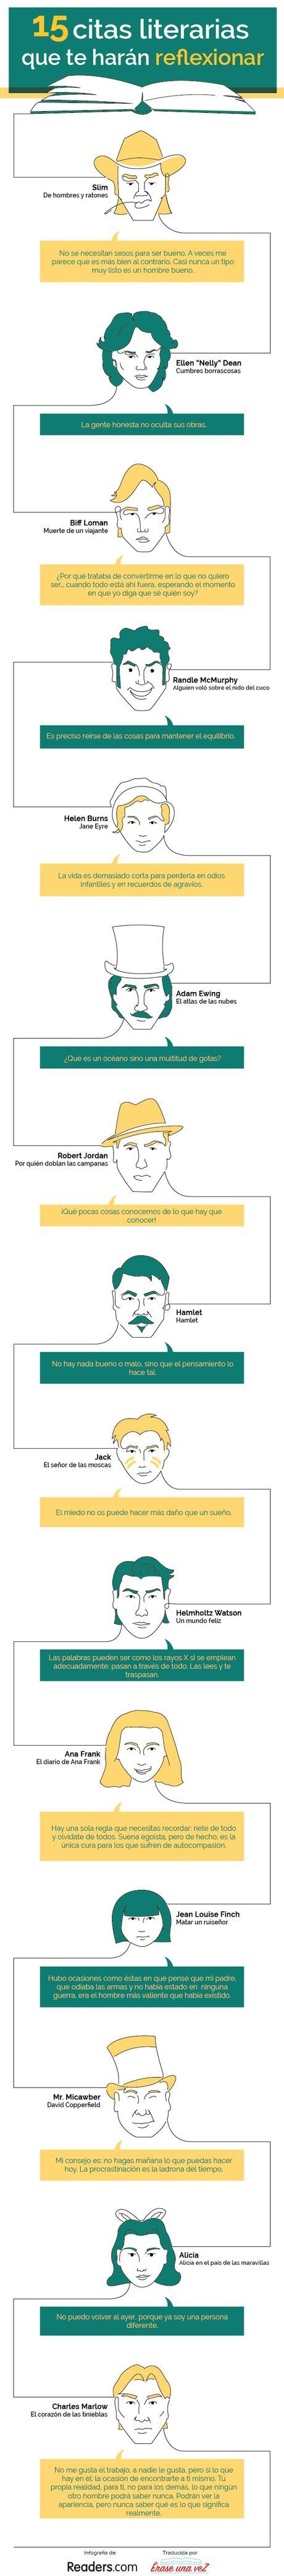 infografia citas litearias